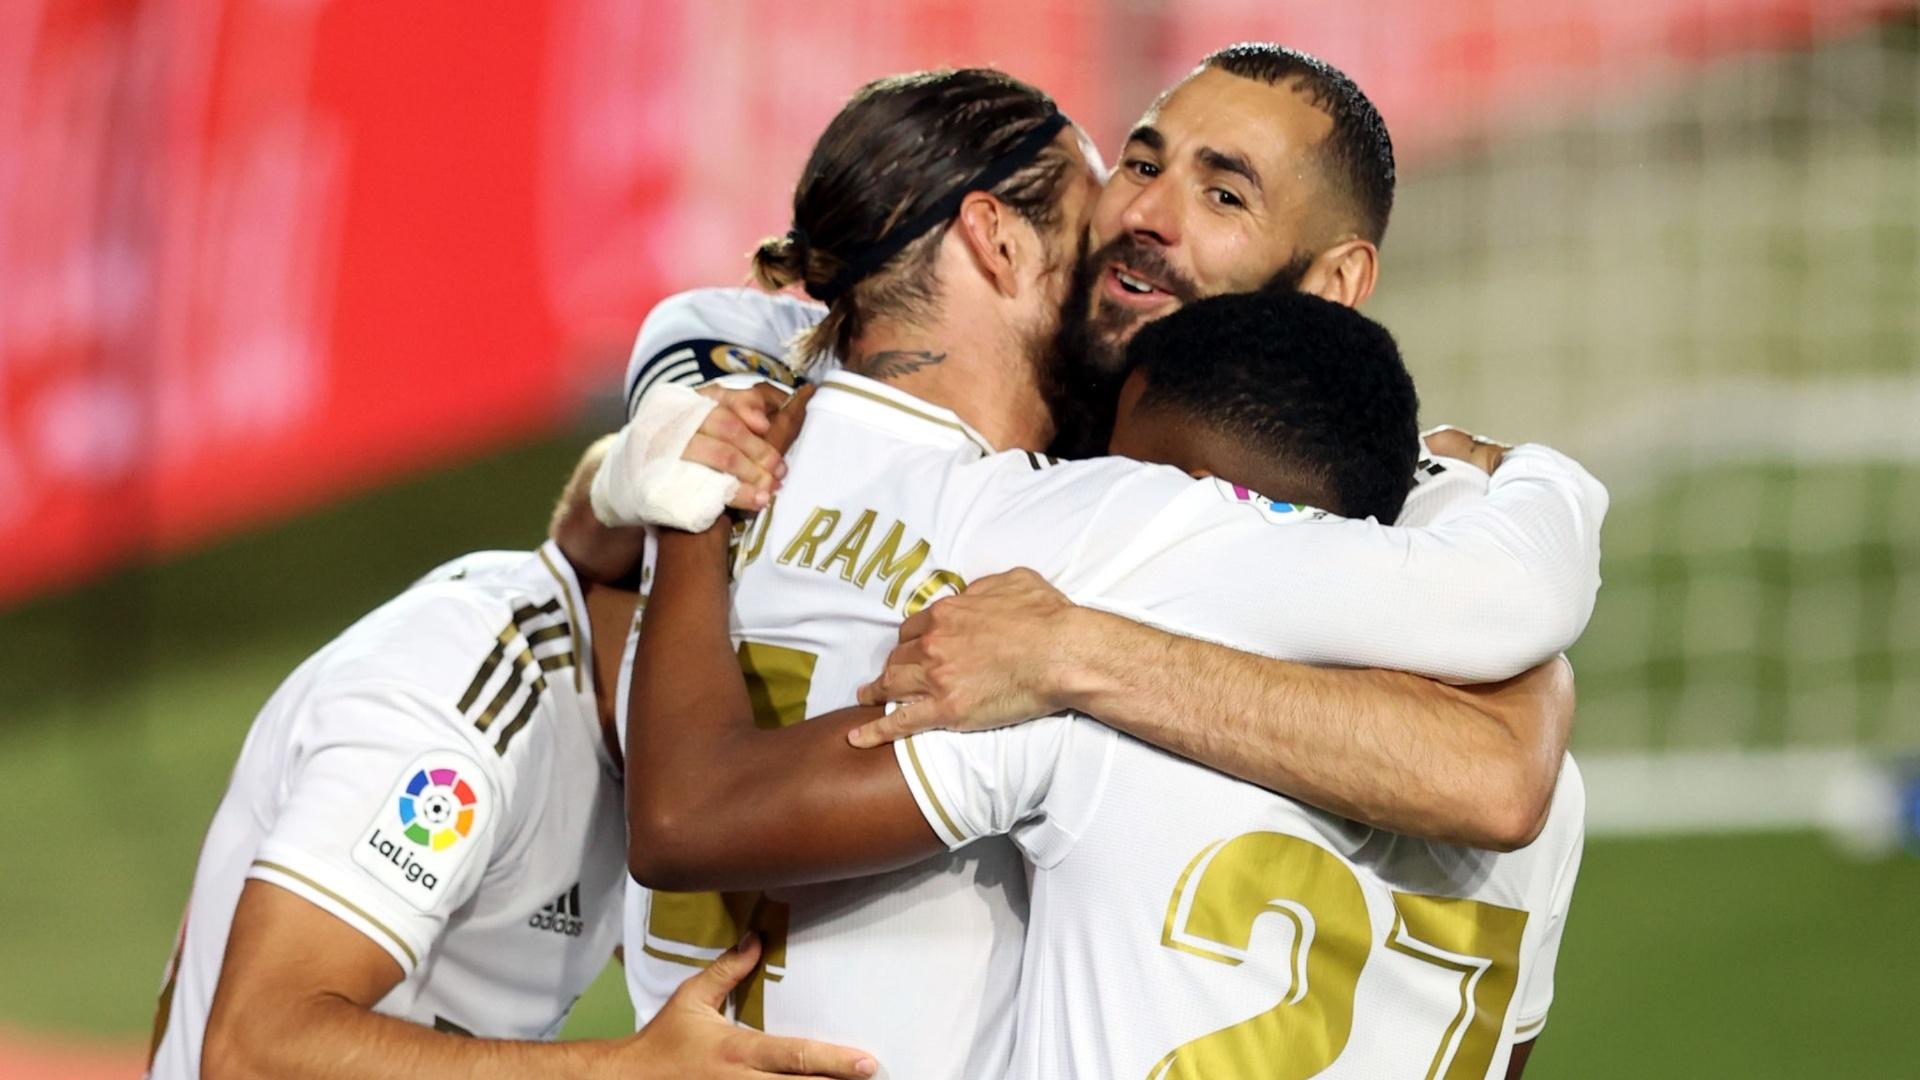 Match Report: Real Madrid 1-0 Getafe